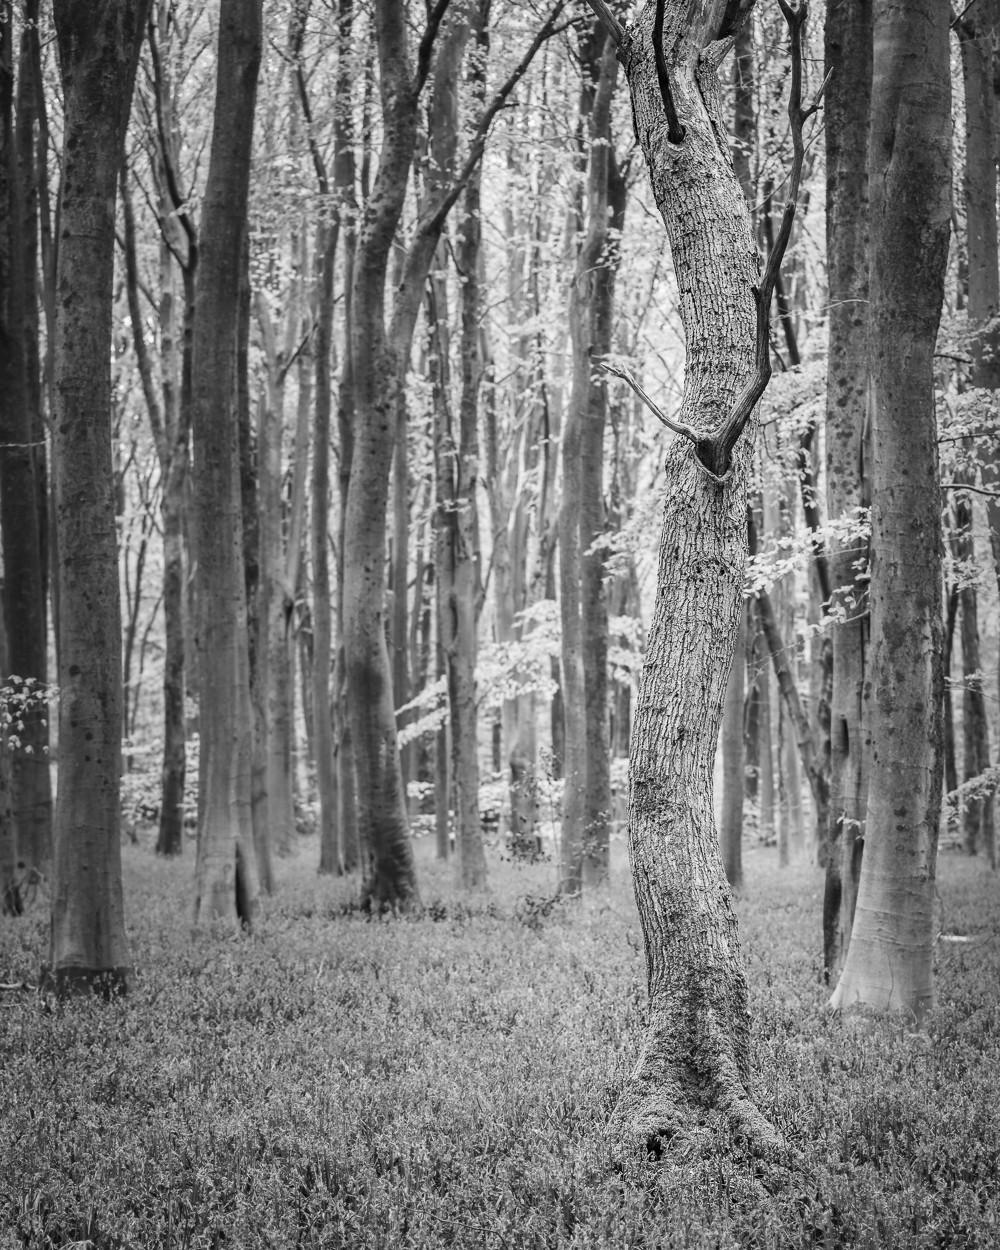 Black & white gnarled tree